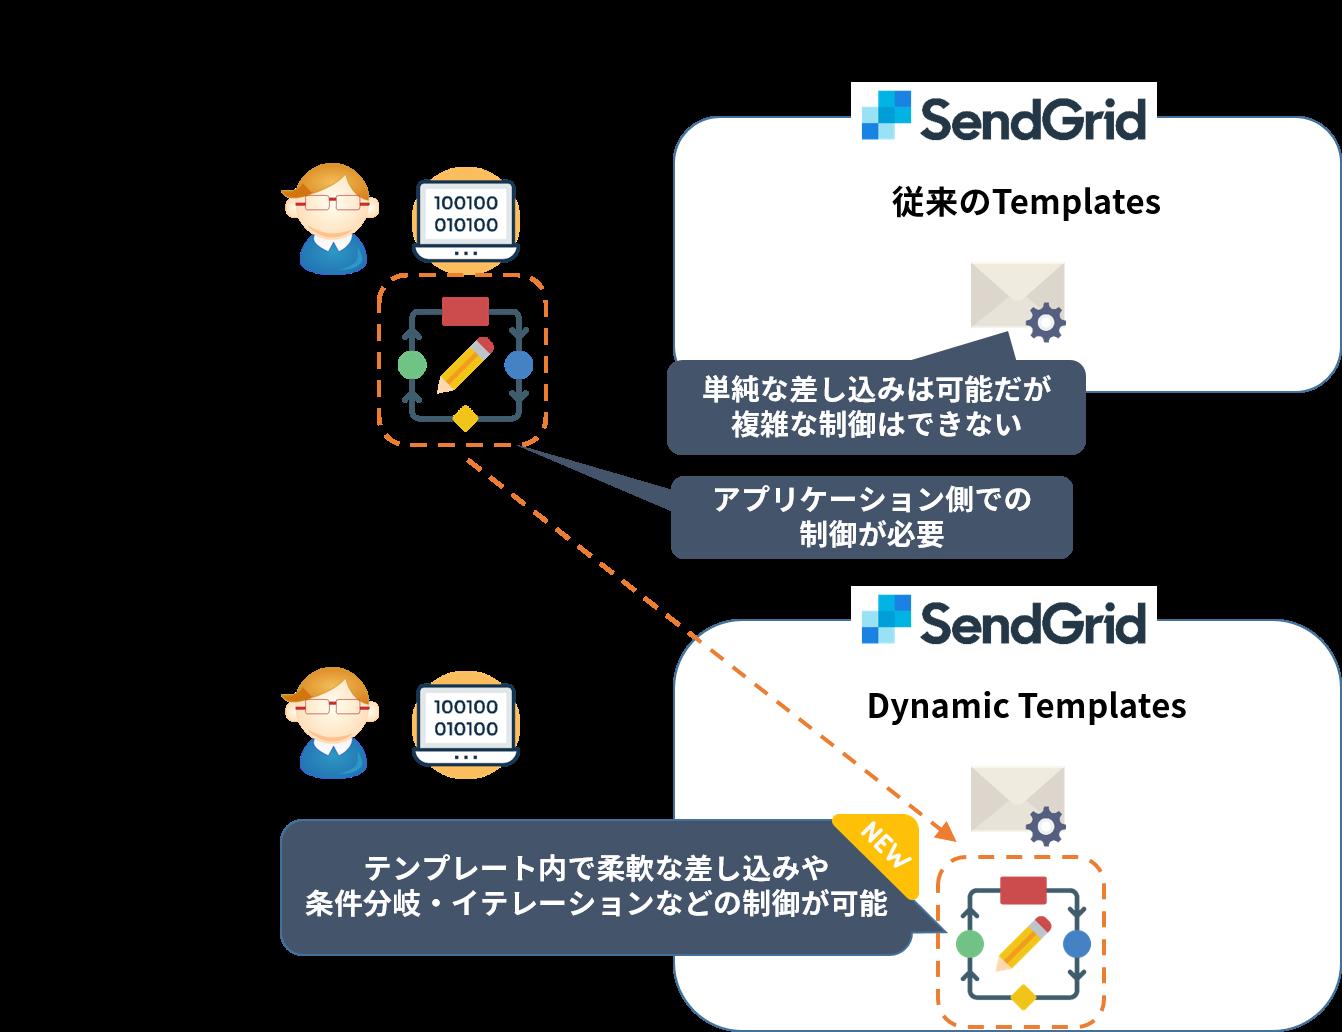 sendgridの新しいテンプレート機能 dynamic templates について qiita